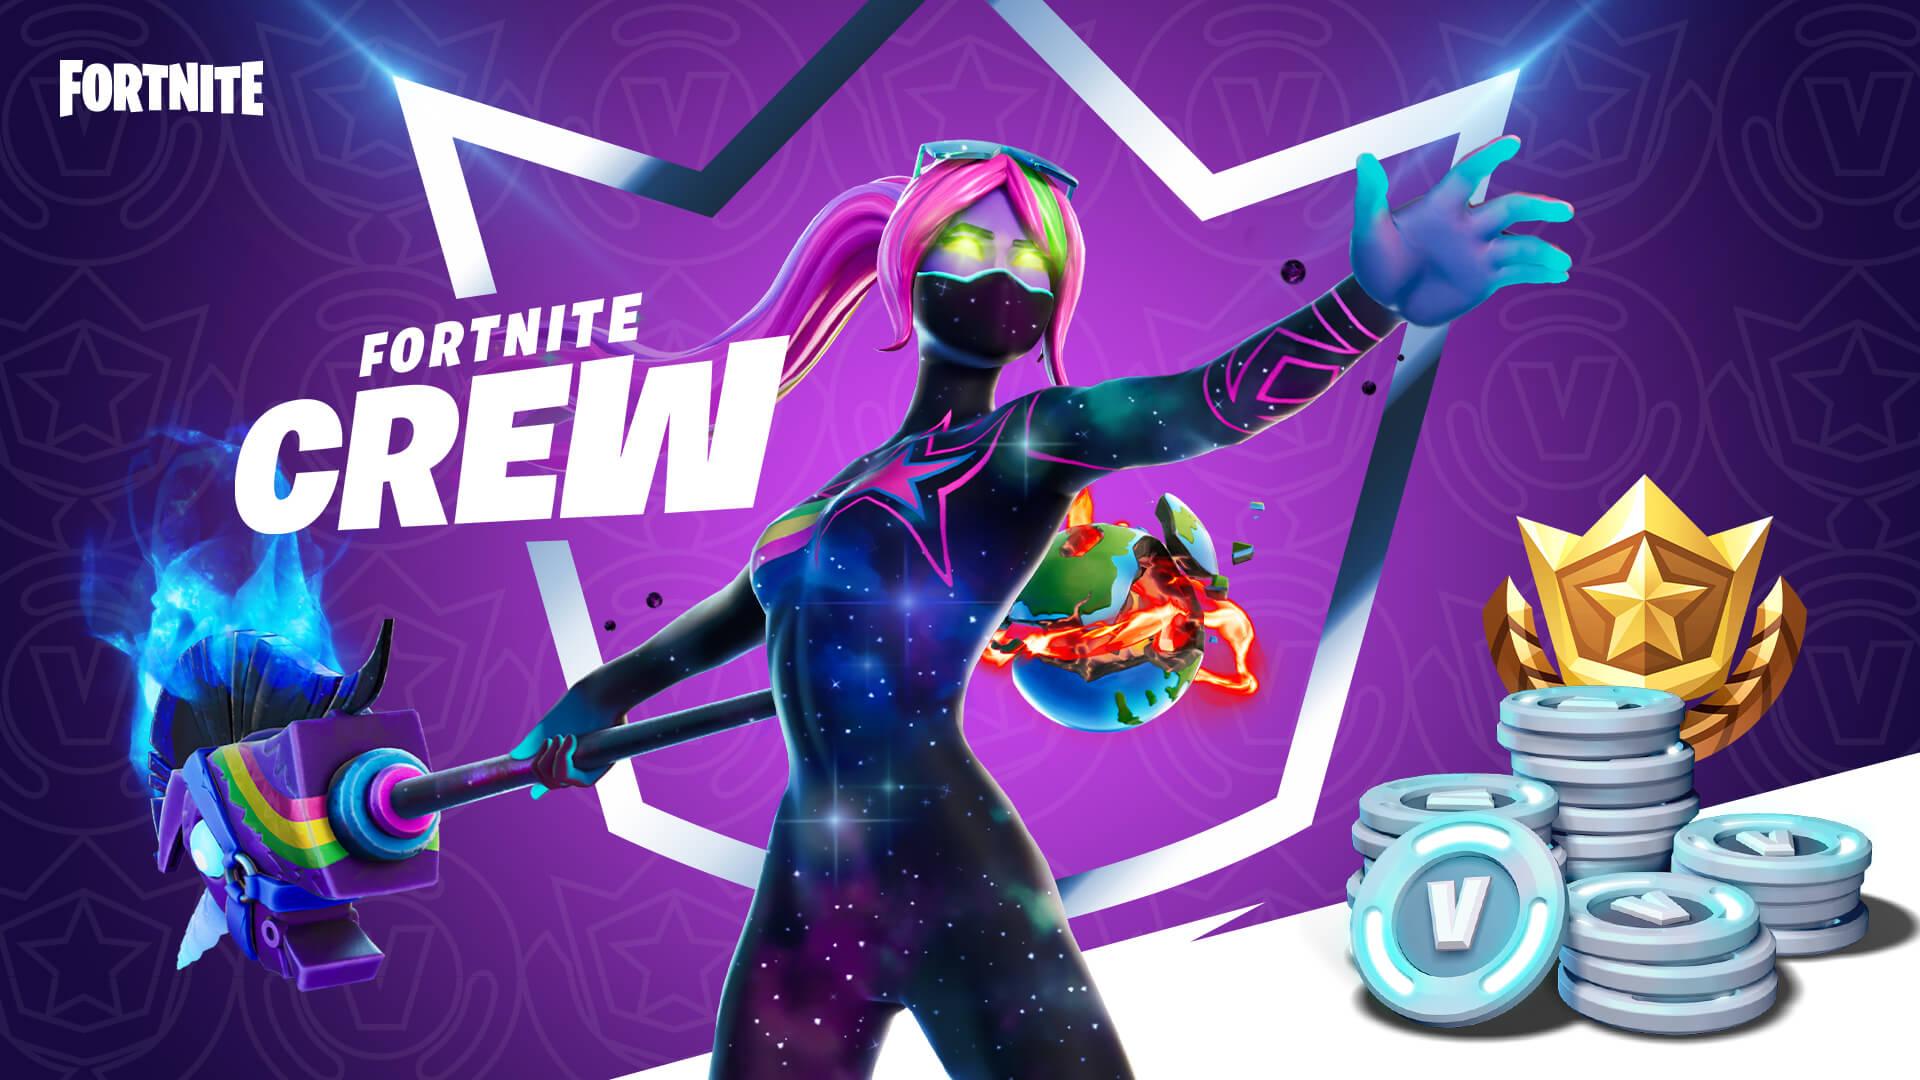 Fortnite Crew image